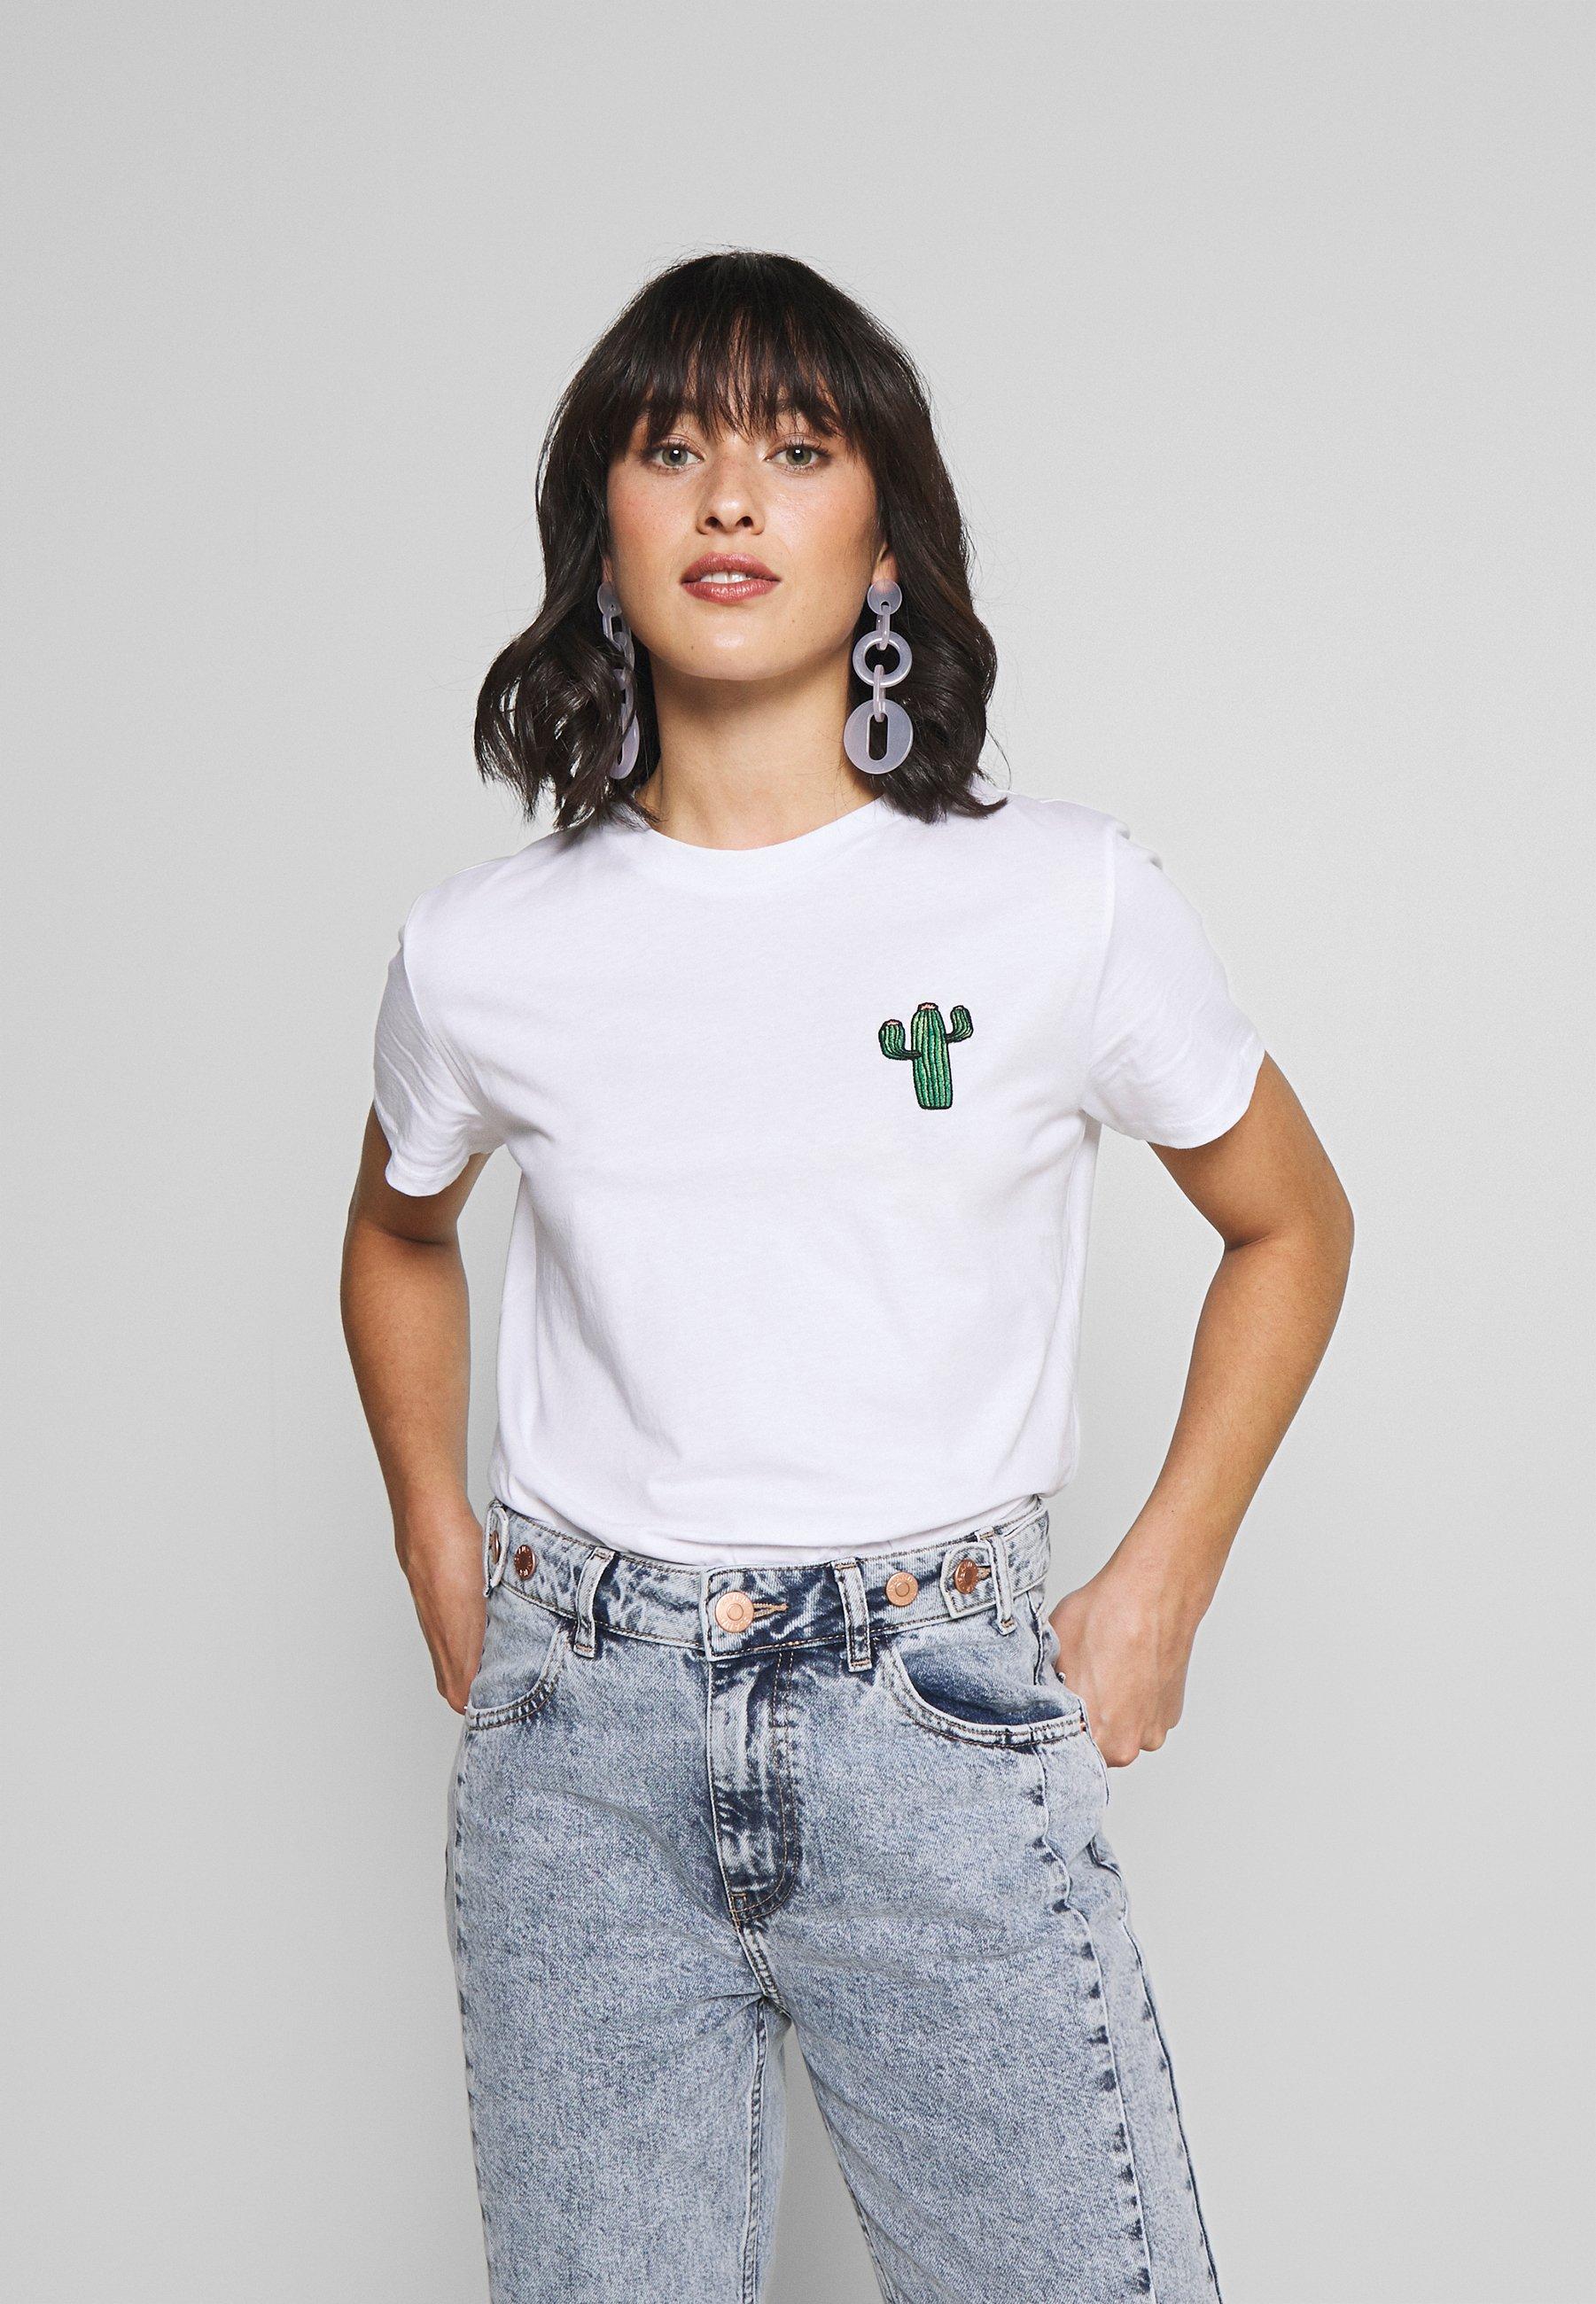 Pieces Petite T-shirt z nadrukiem - bright white/cactus